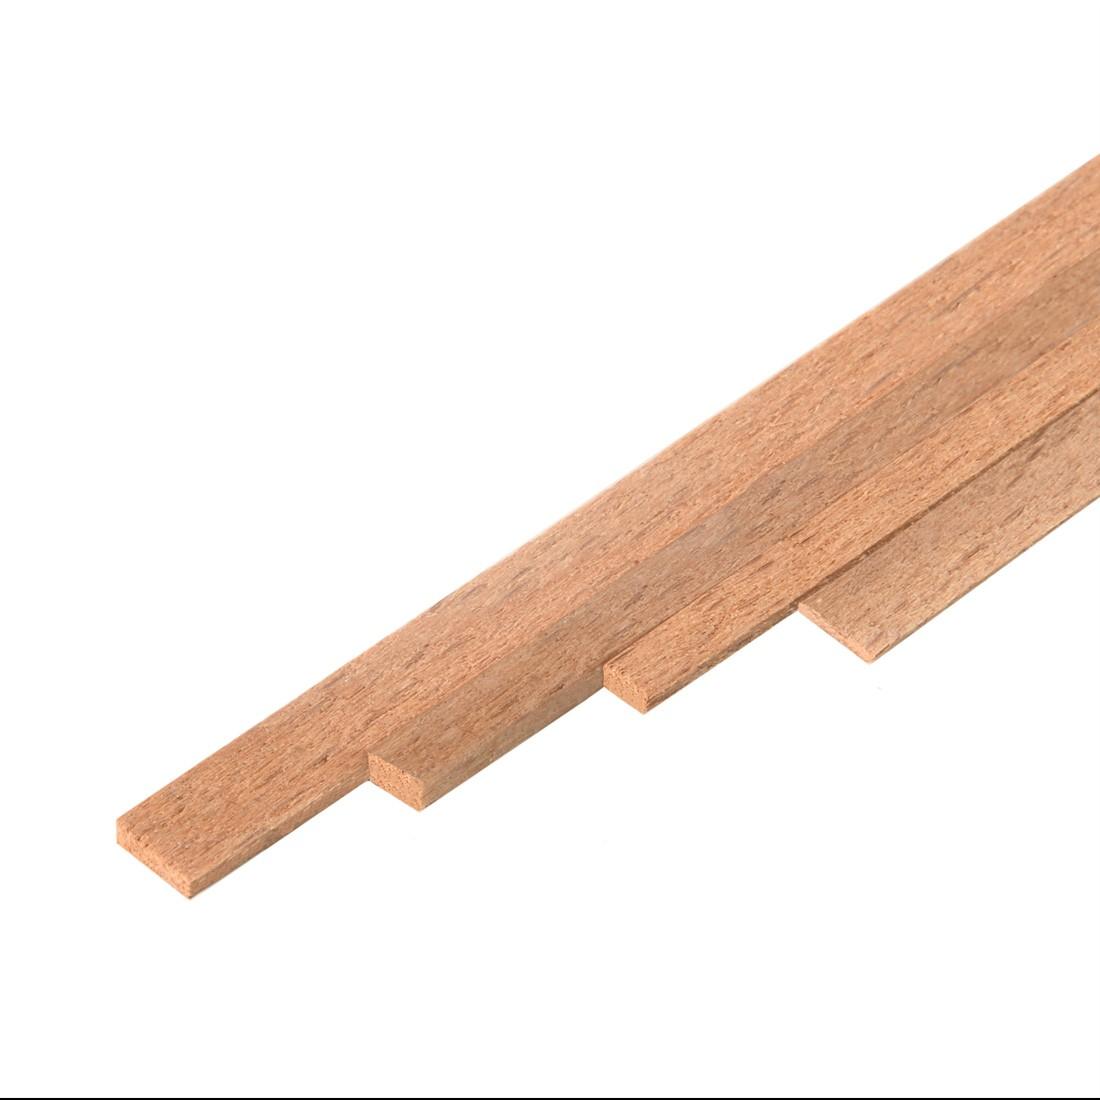 Beechwood strip 0,6x3